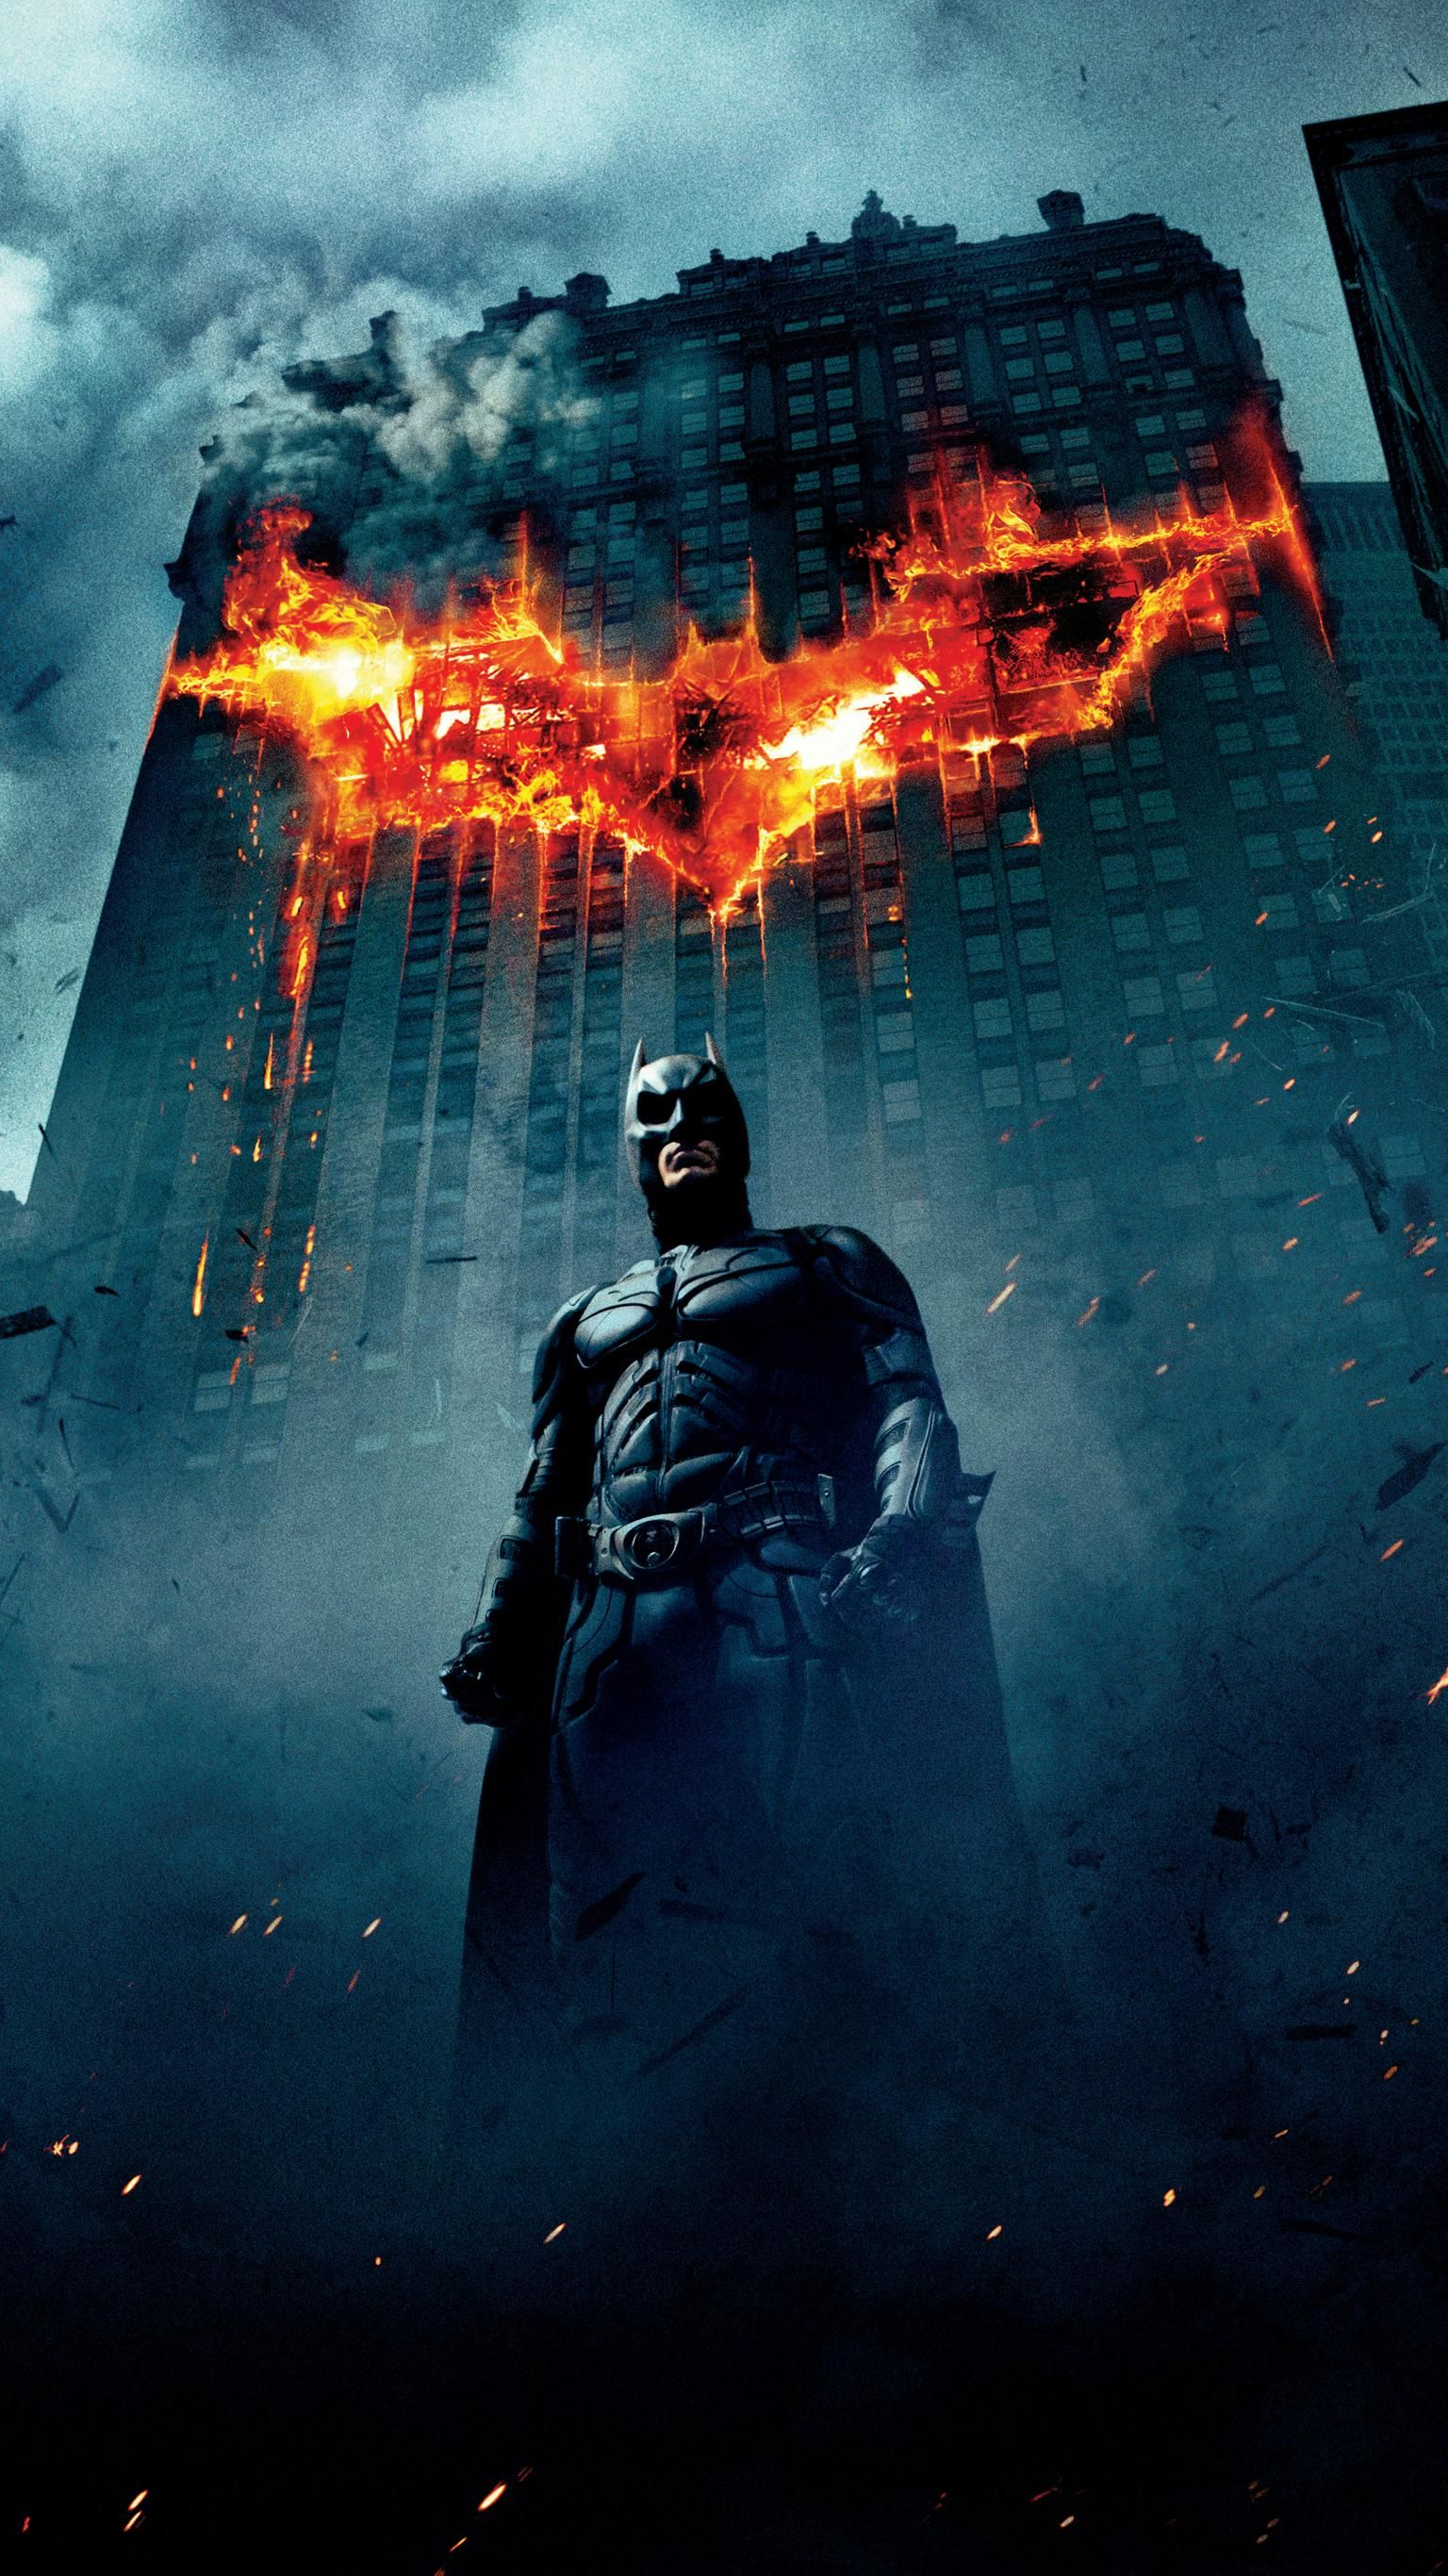 The Dark Knight 2008 Phone Wallpaper Moviemania The Dark Knight Poster Dark Knight Wallpaper Batman The Dark Knight